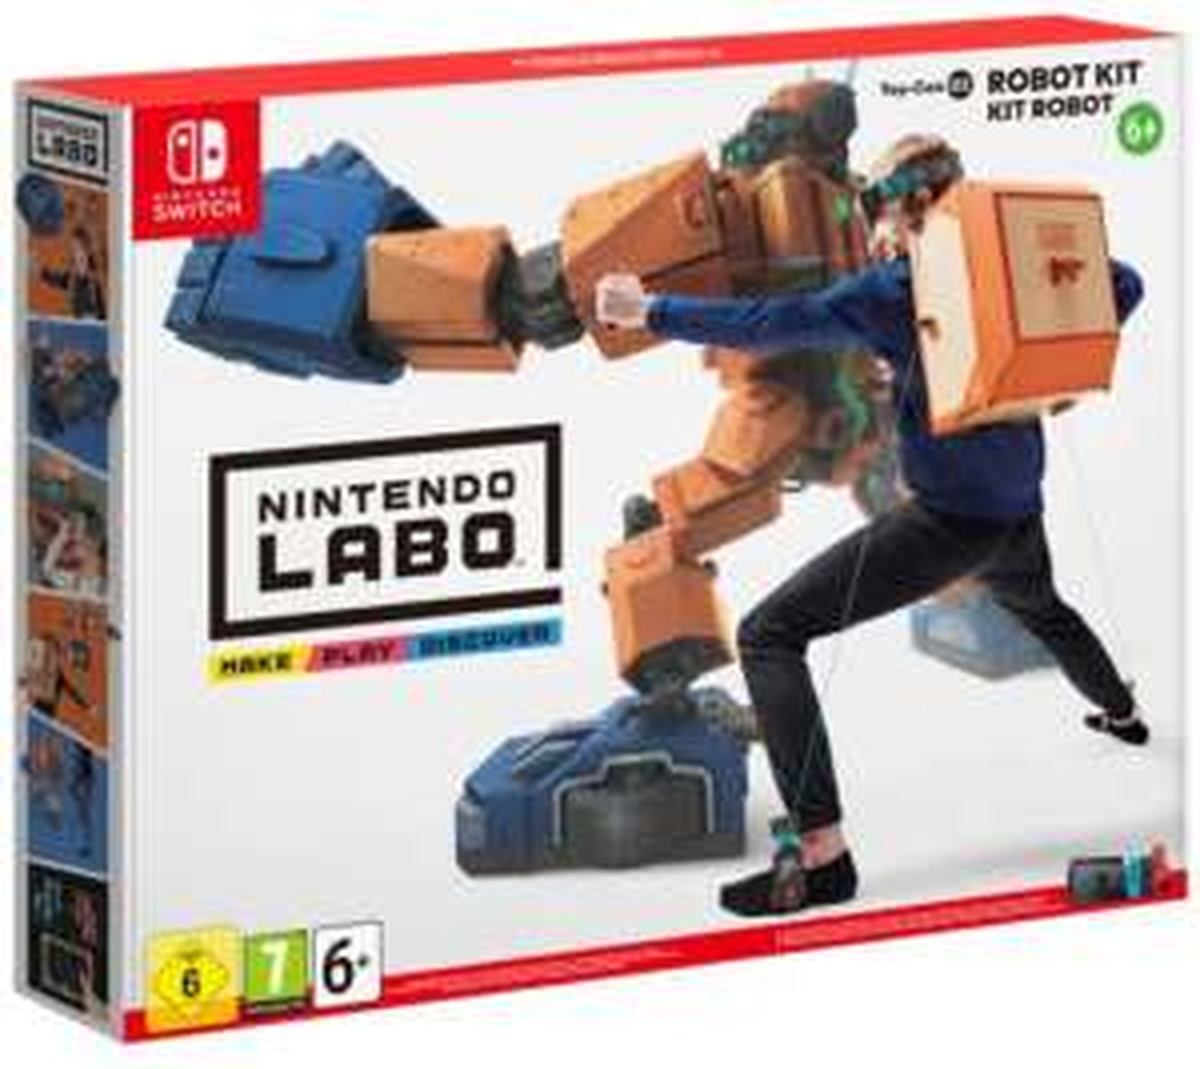 Nintendo Labo - Robotpakket (Toy-Con 02) voor €39 @ Gameshop Twente